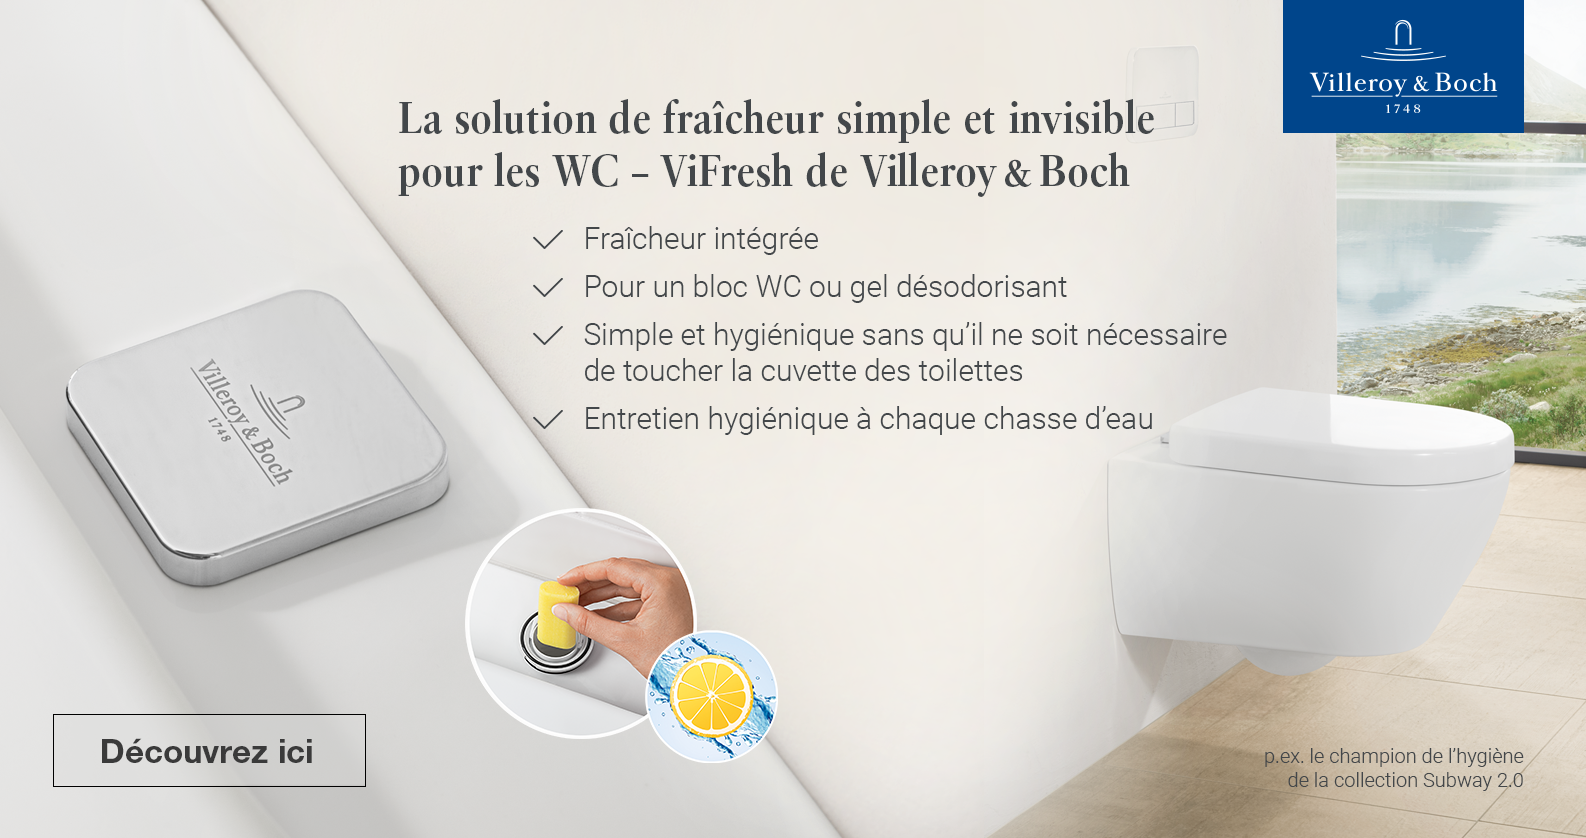 Villeroy & Boch Hygiene Champion chez xTWOstore